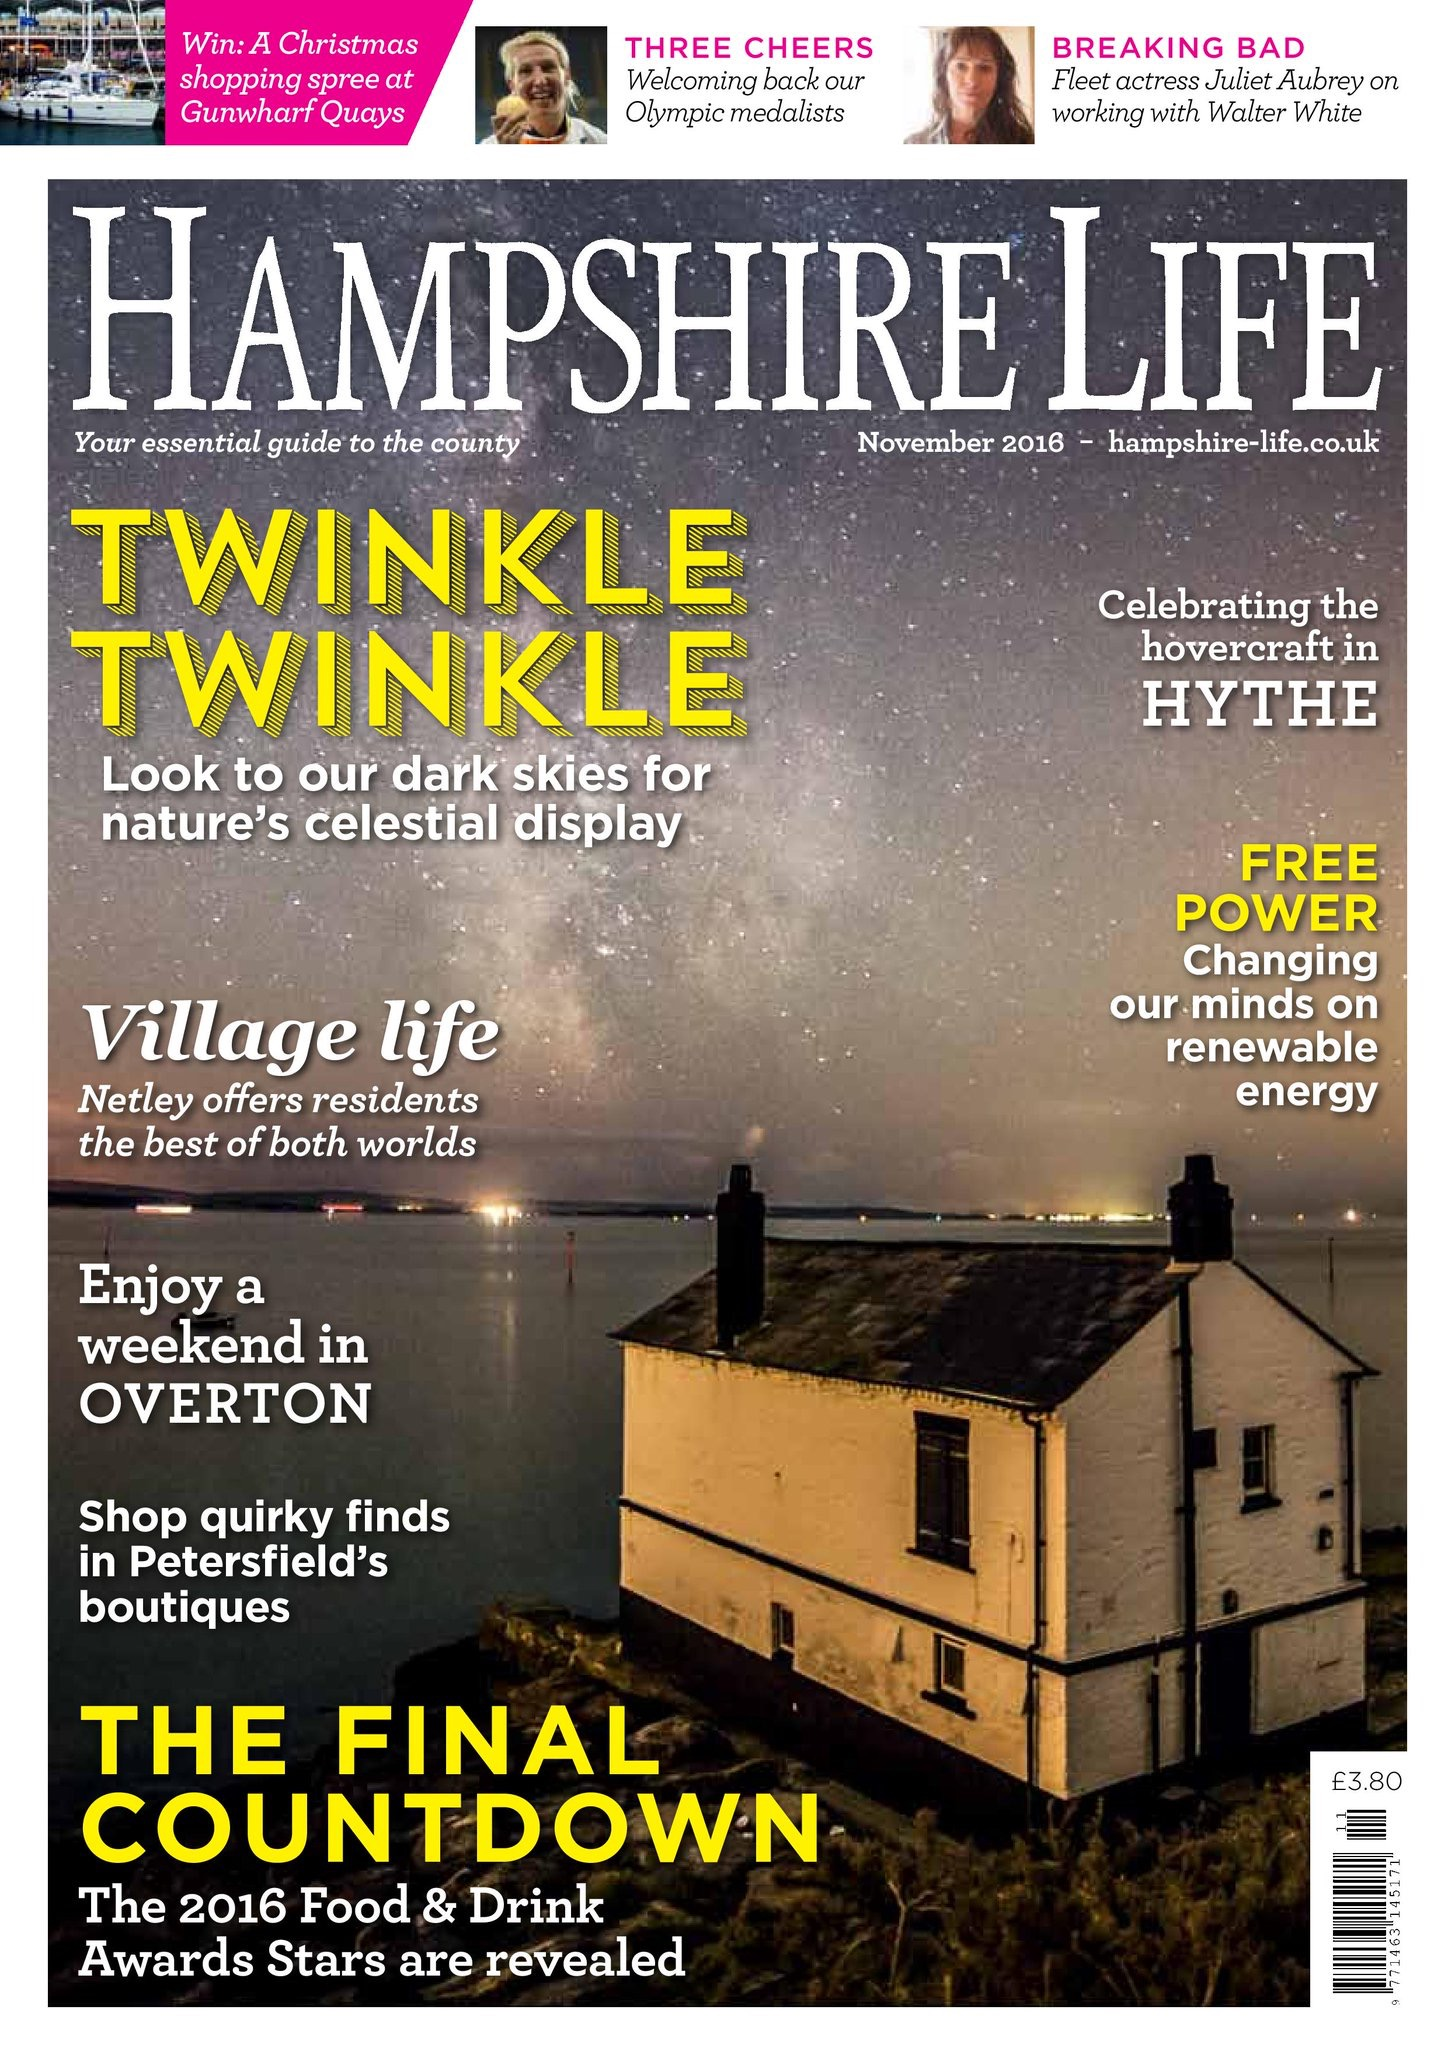 Hampshire Life November 2016